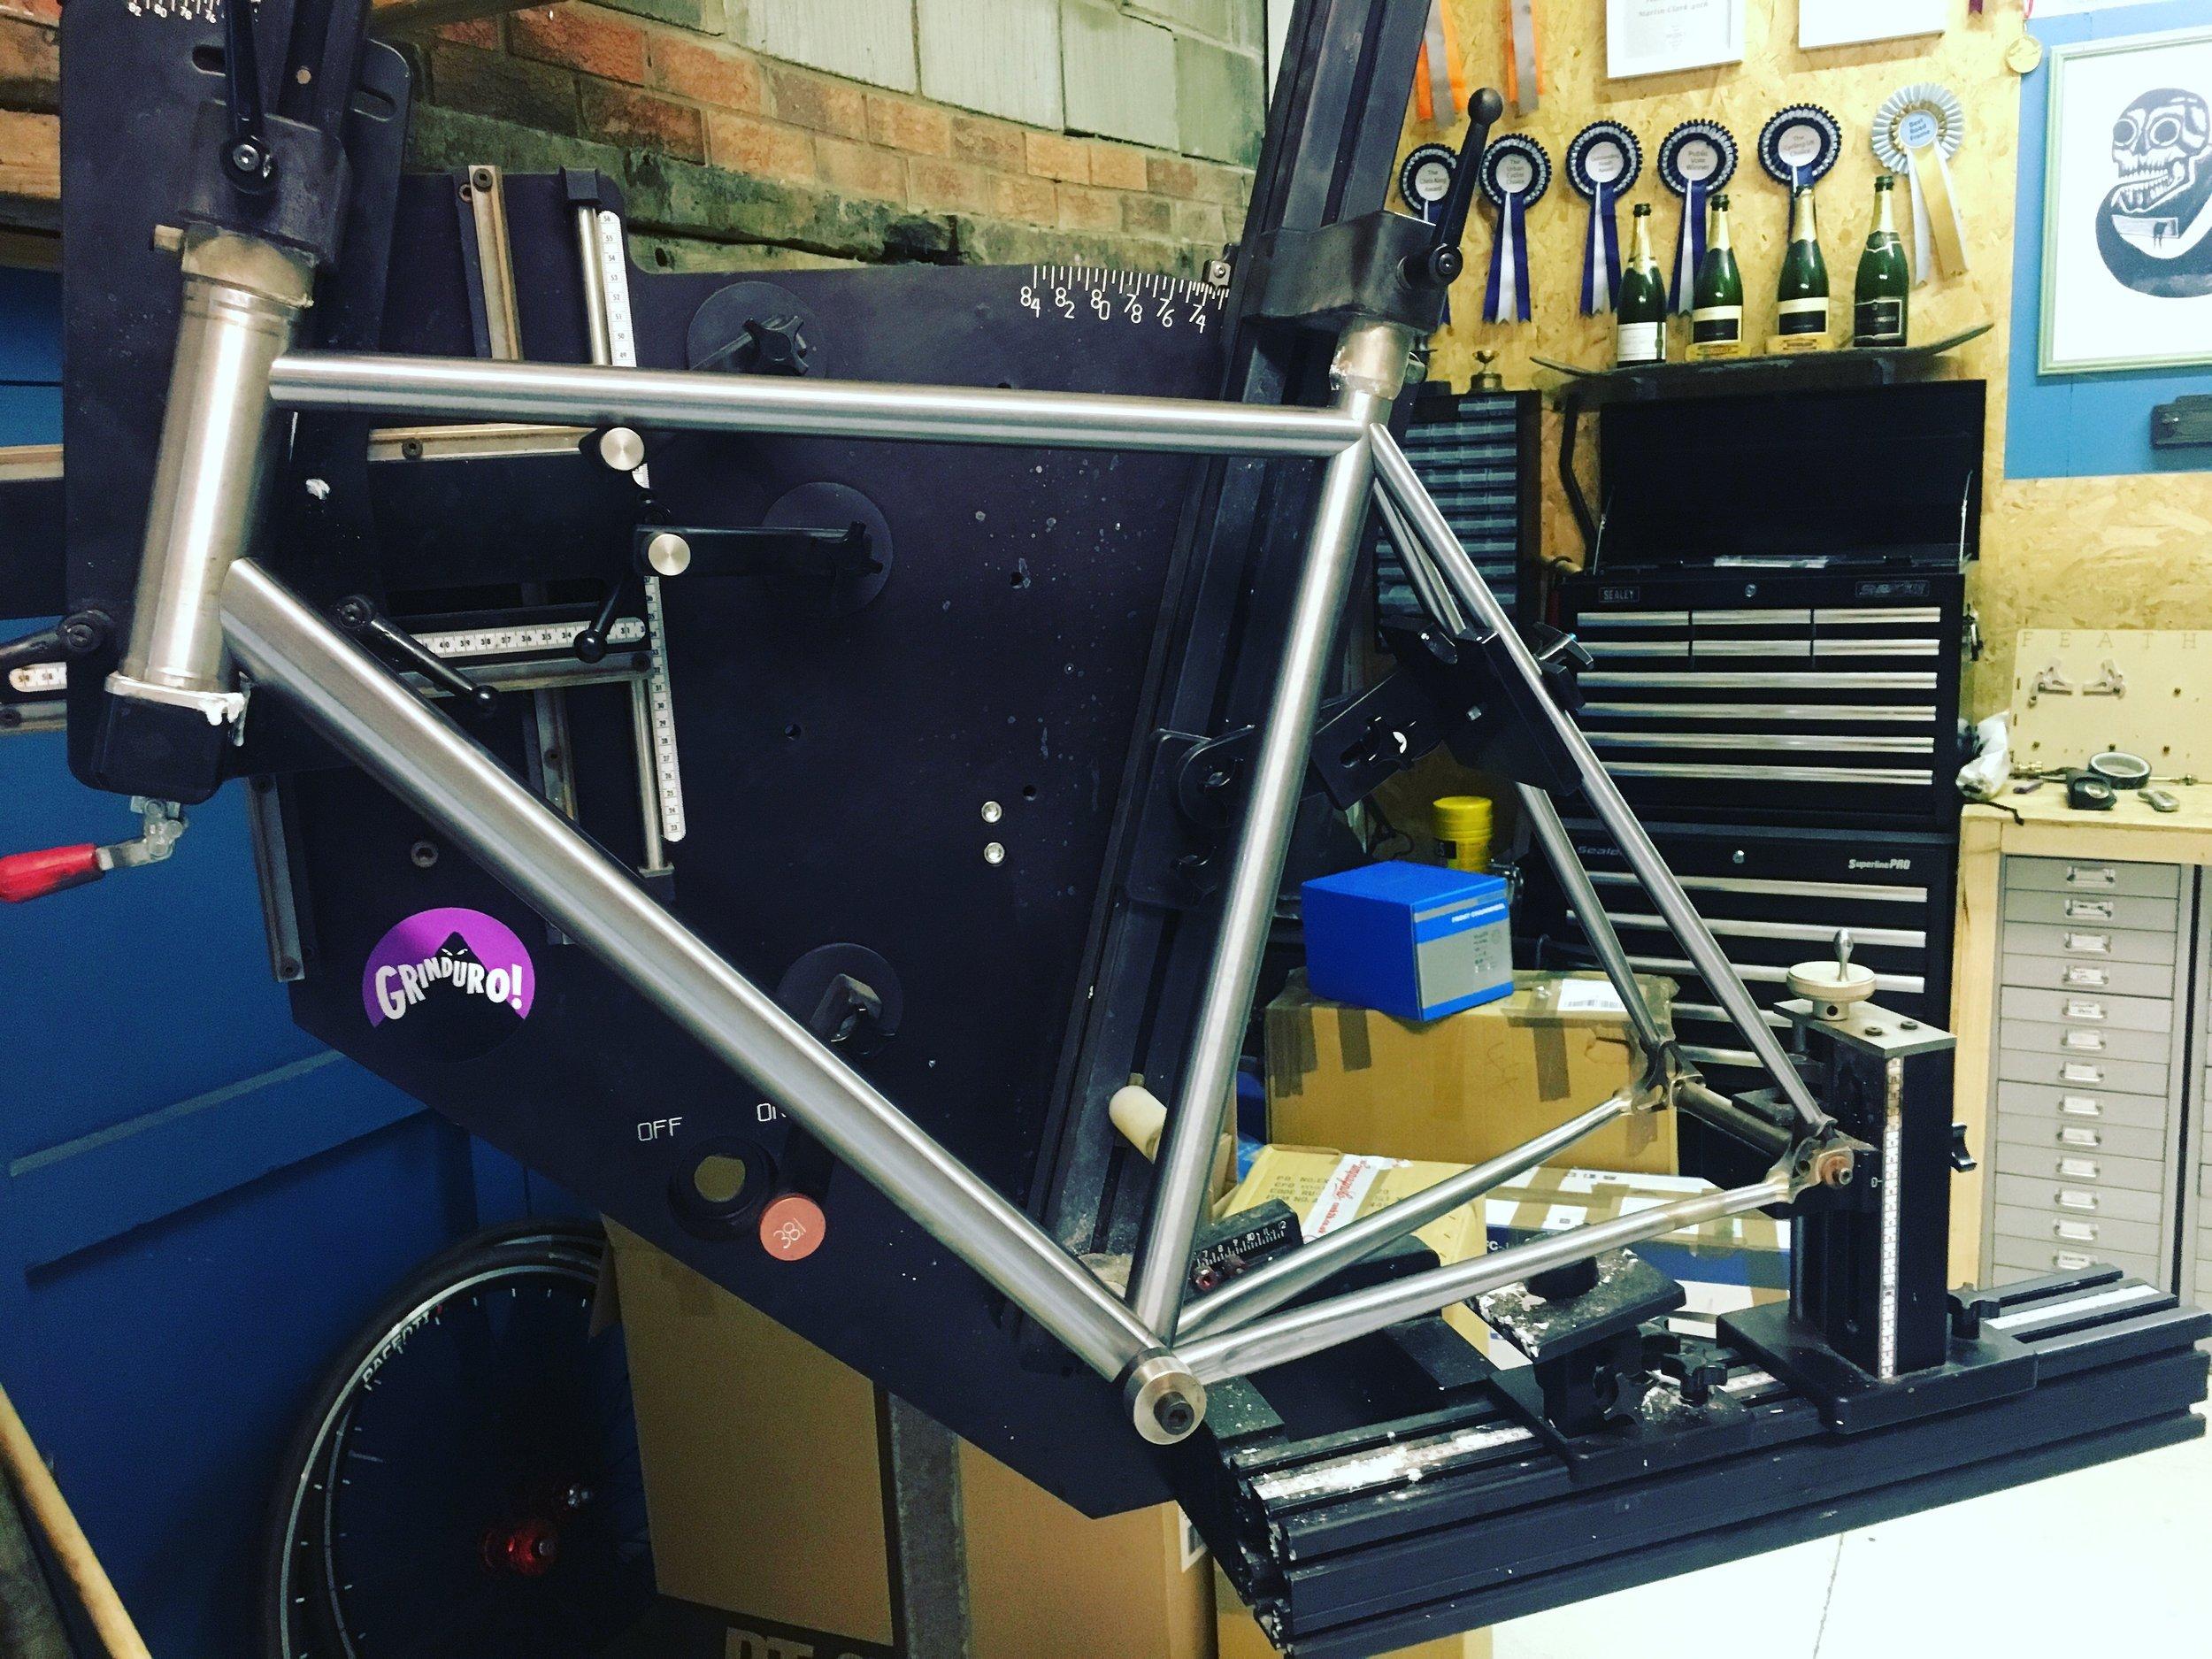 Mitred modern road bike frame in the frame fixture.